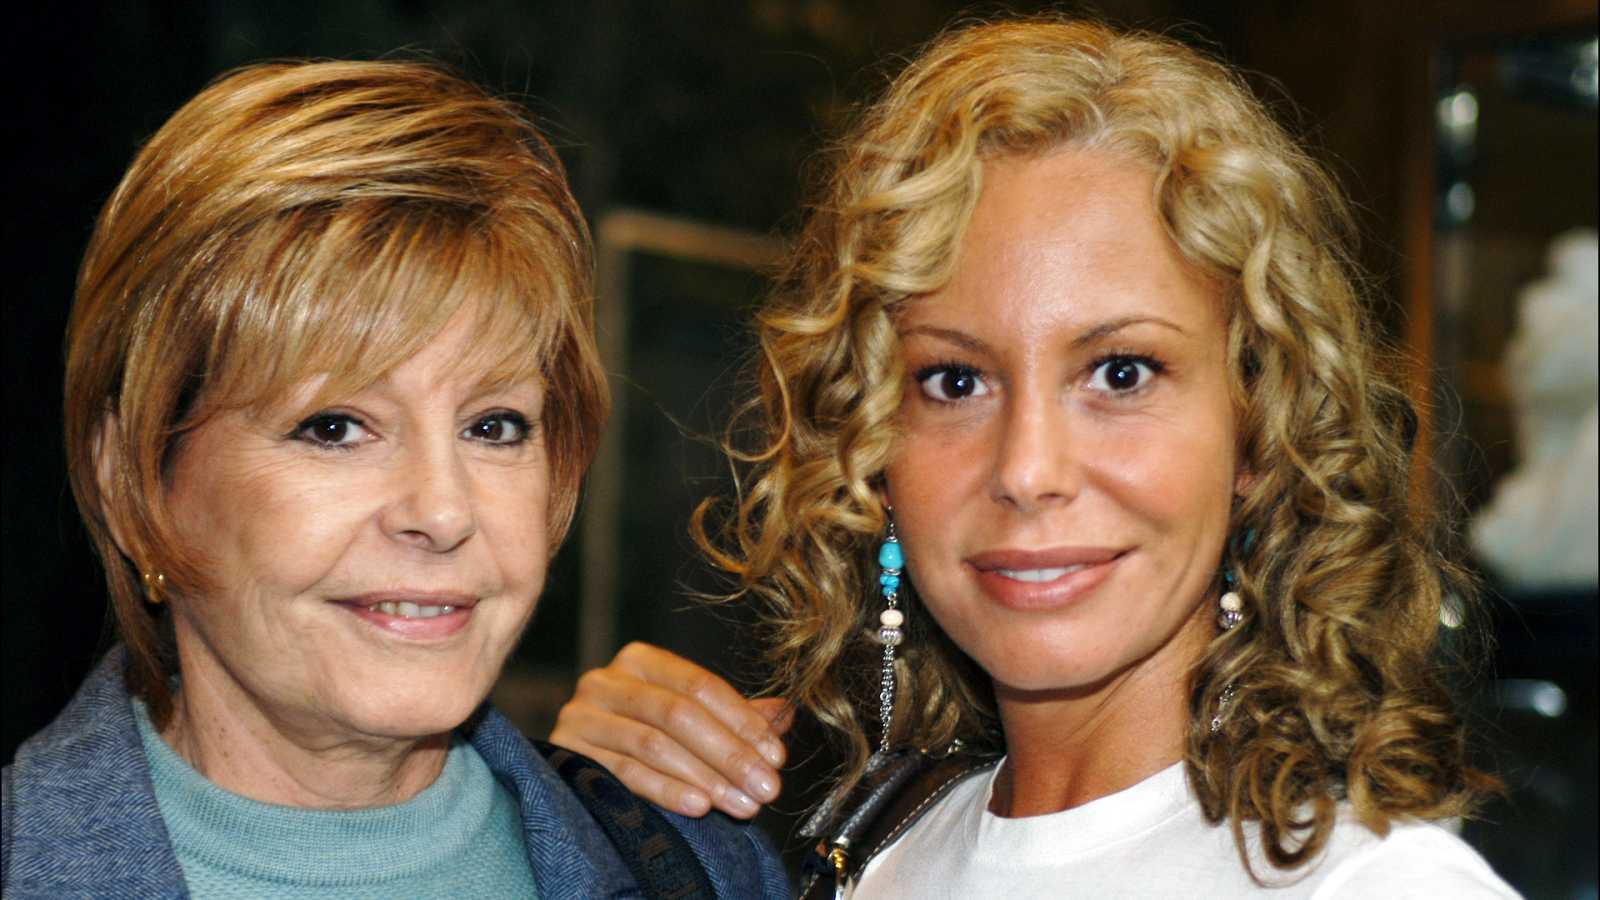 Lara Dilbildos y Laura Valenzuela, el cáncer